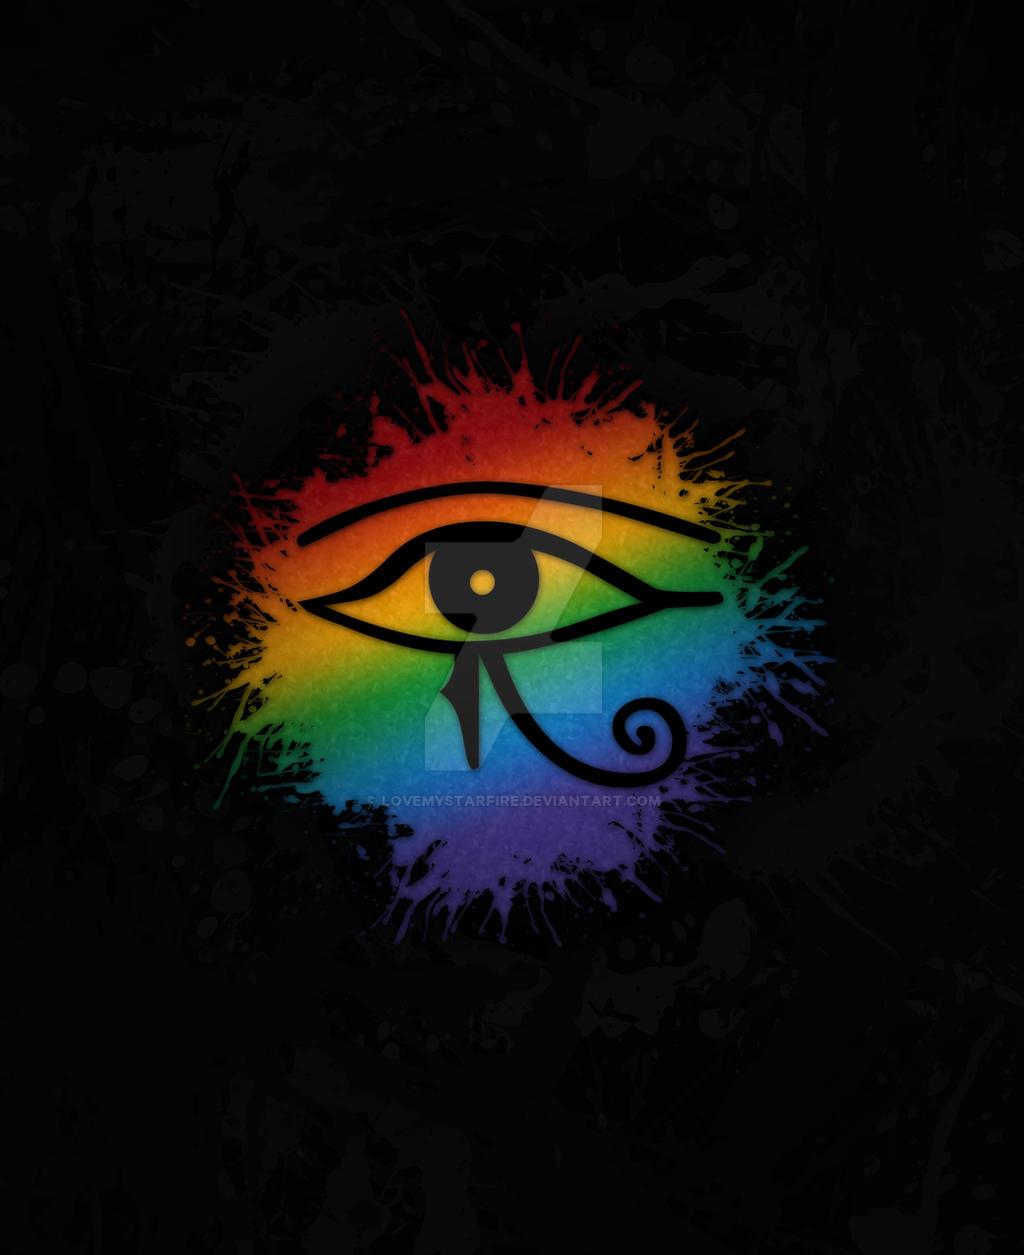 Lgbt Egyptian Eye Of Ra By Lovemystarfire On Deviantart